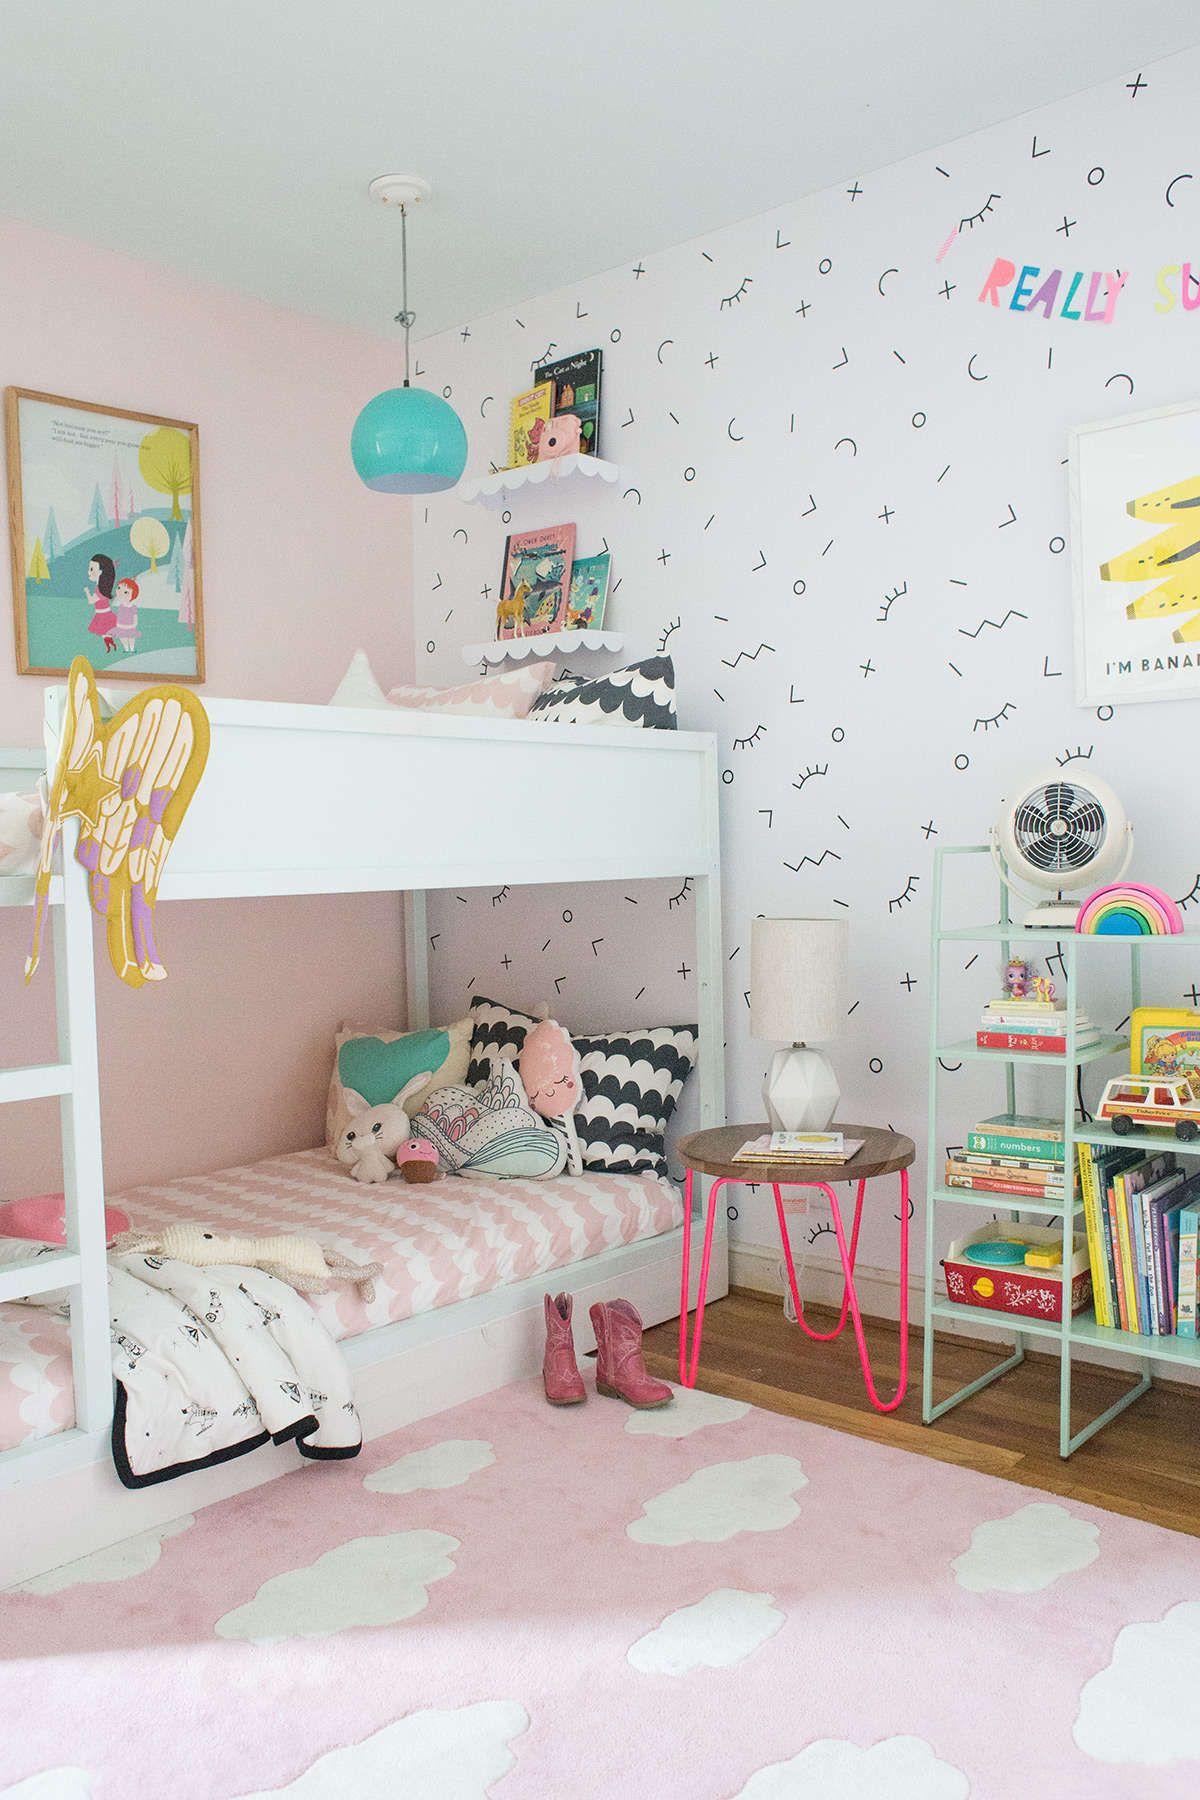 DIY riser for IKEA kura bed Habitaciones infantiles